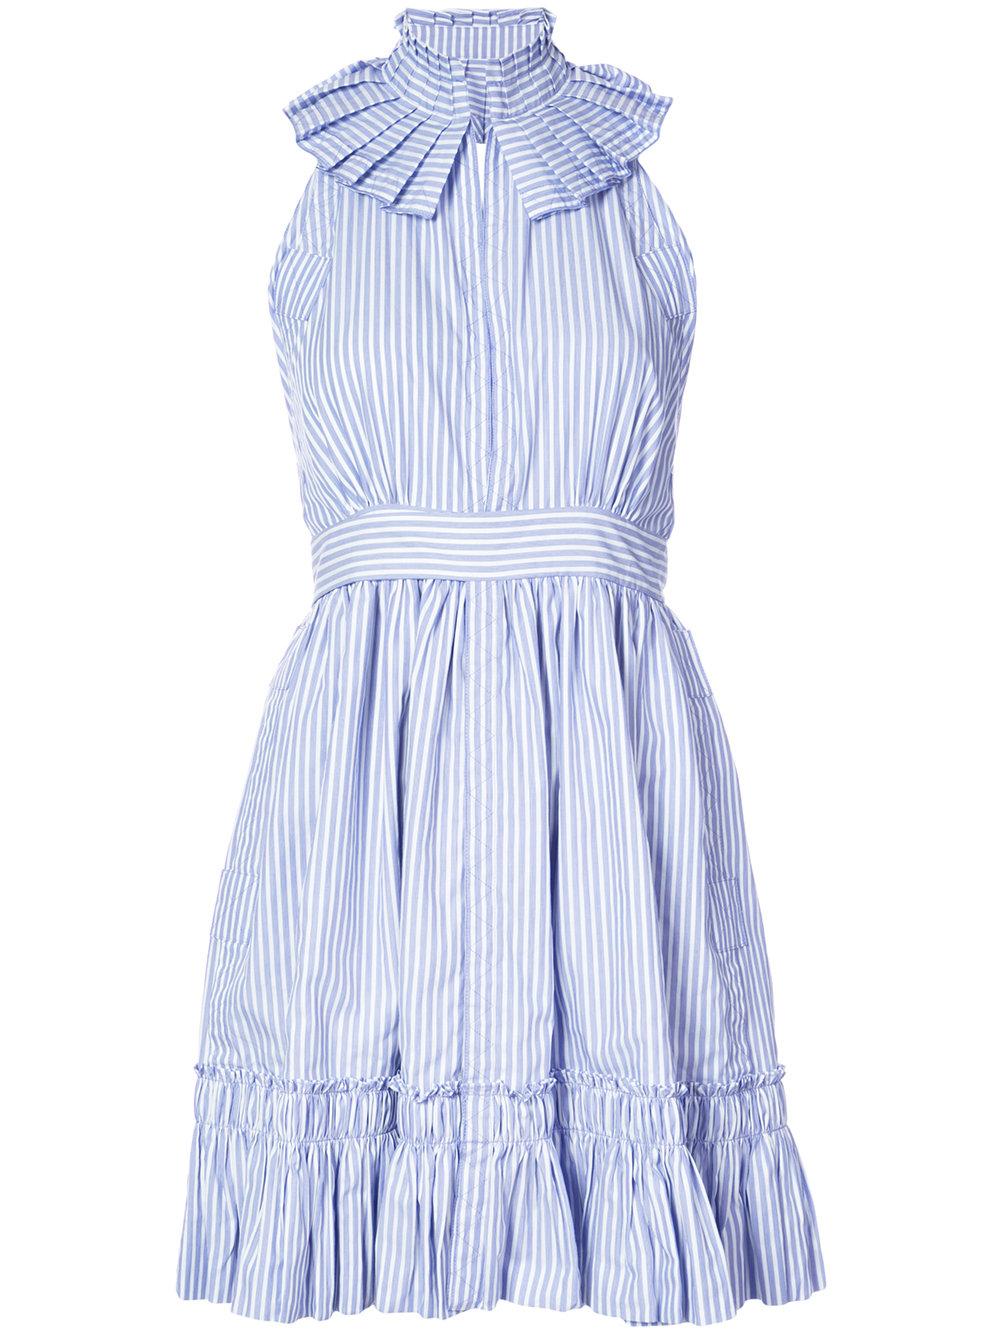 ALEXIS dress $585